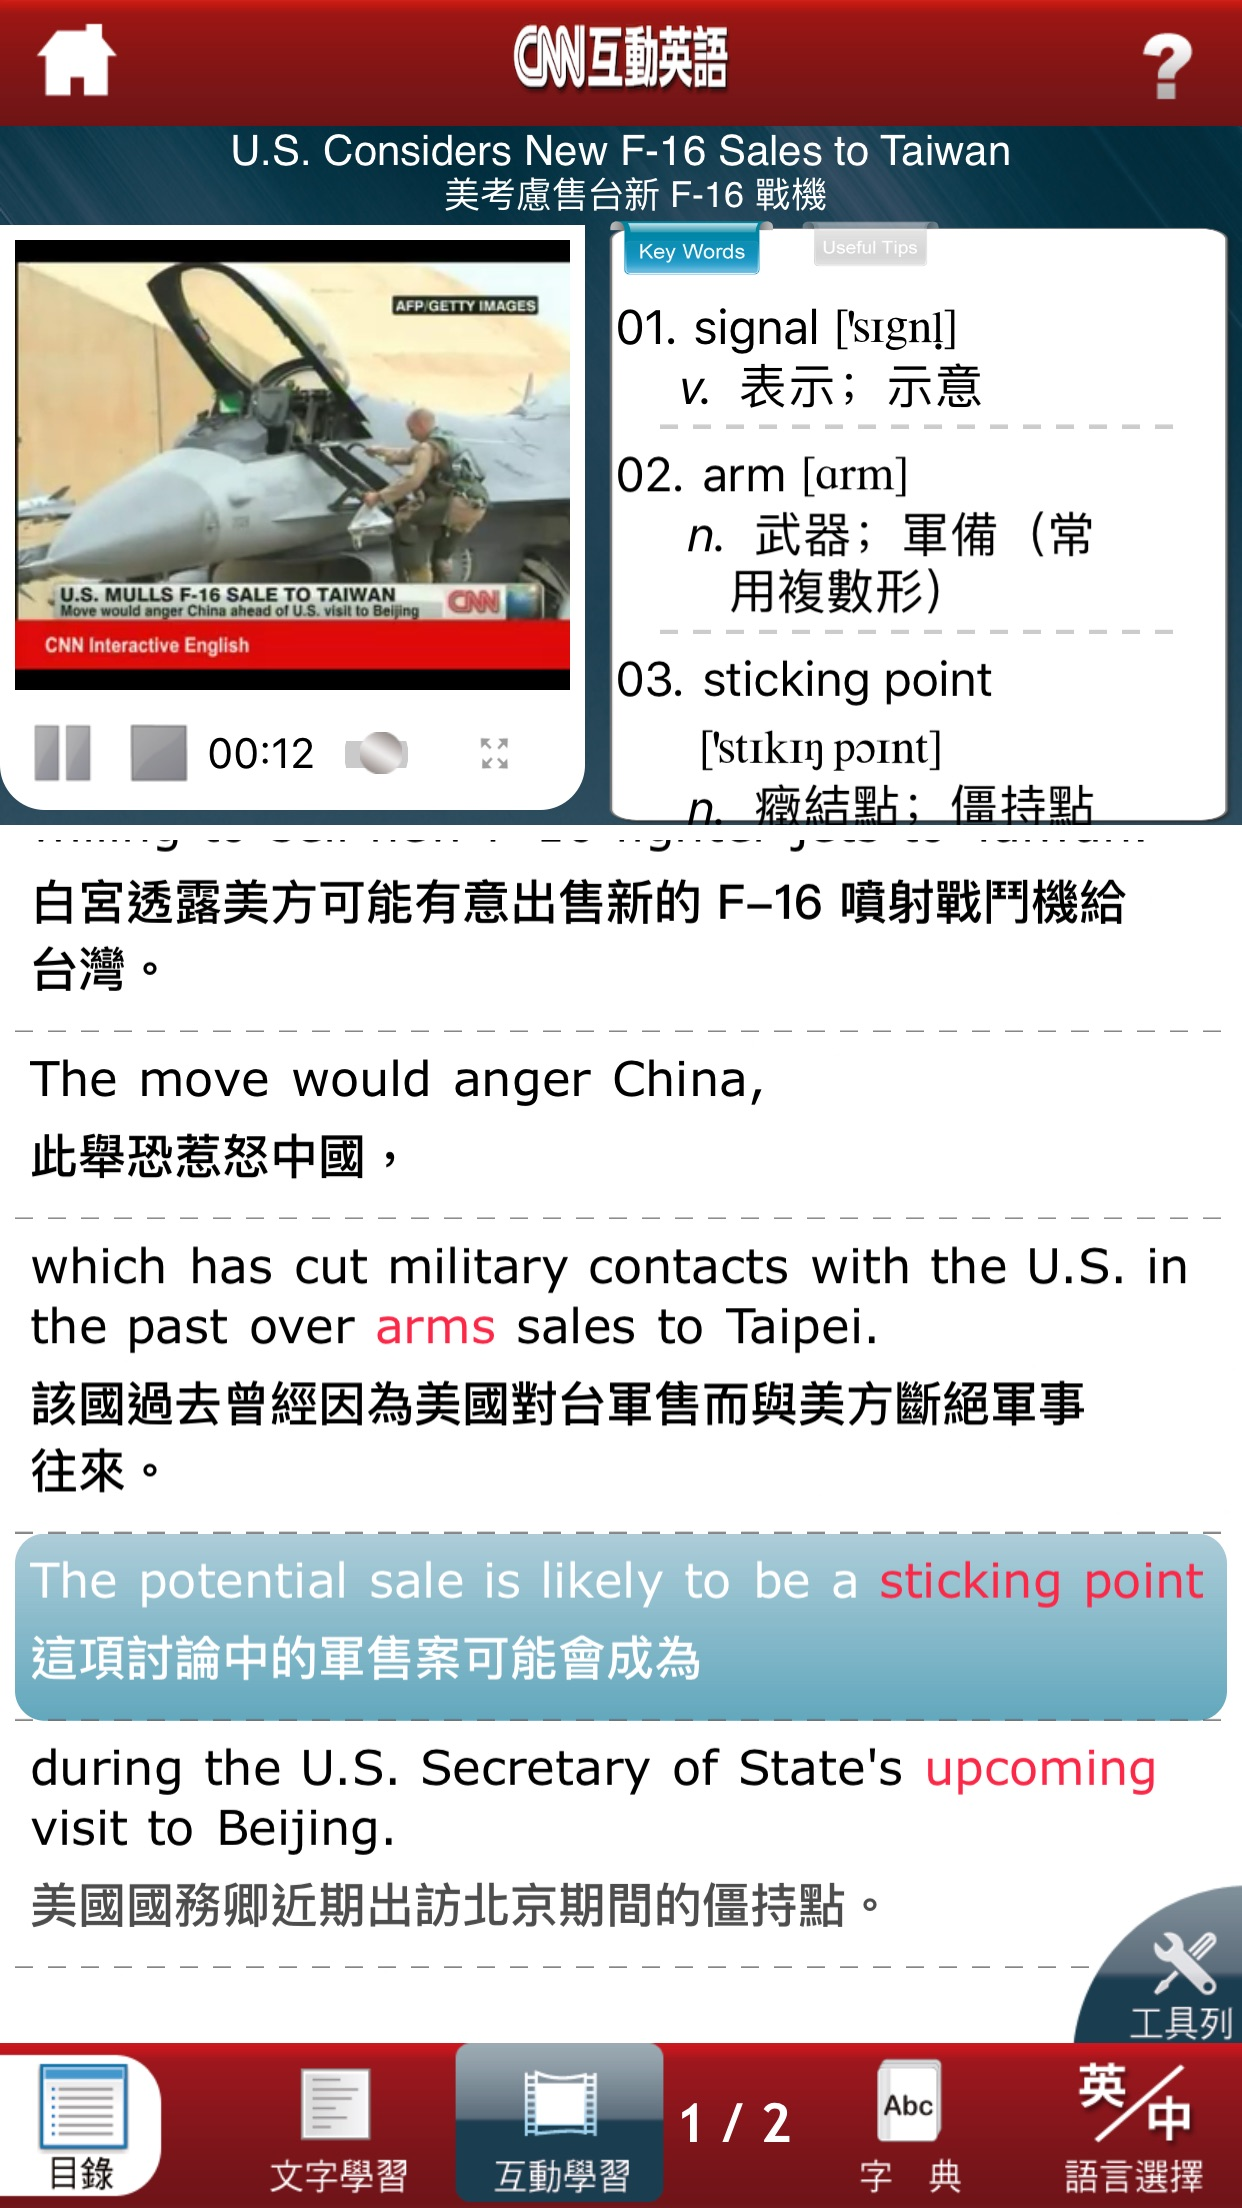 LiveABC CNN 互動英語 Screenshot